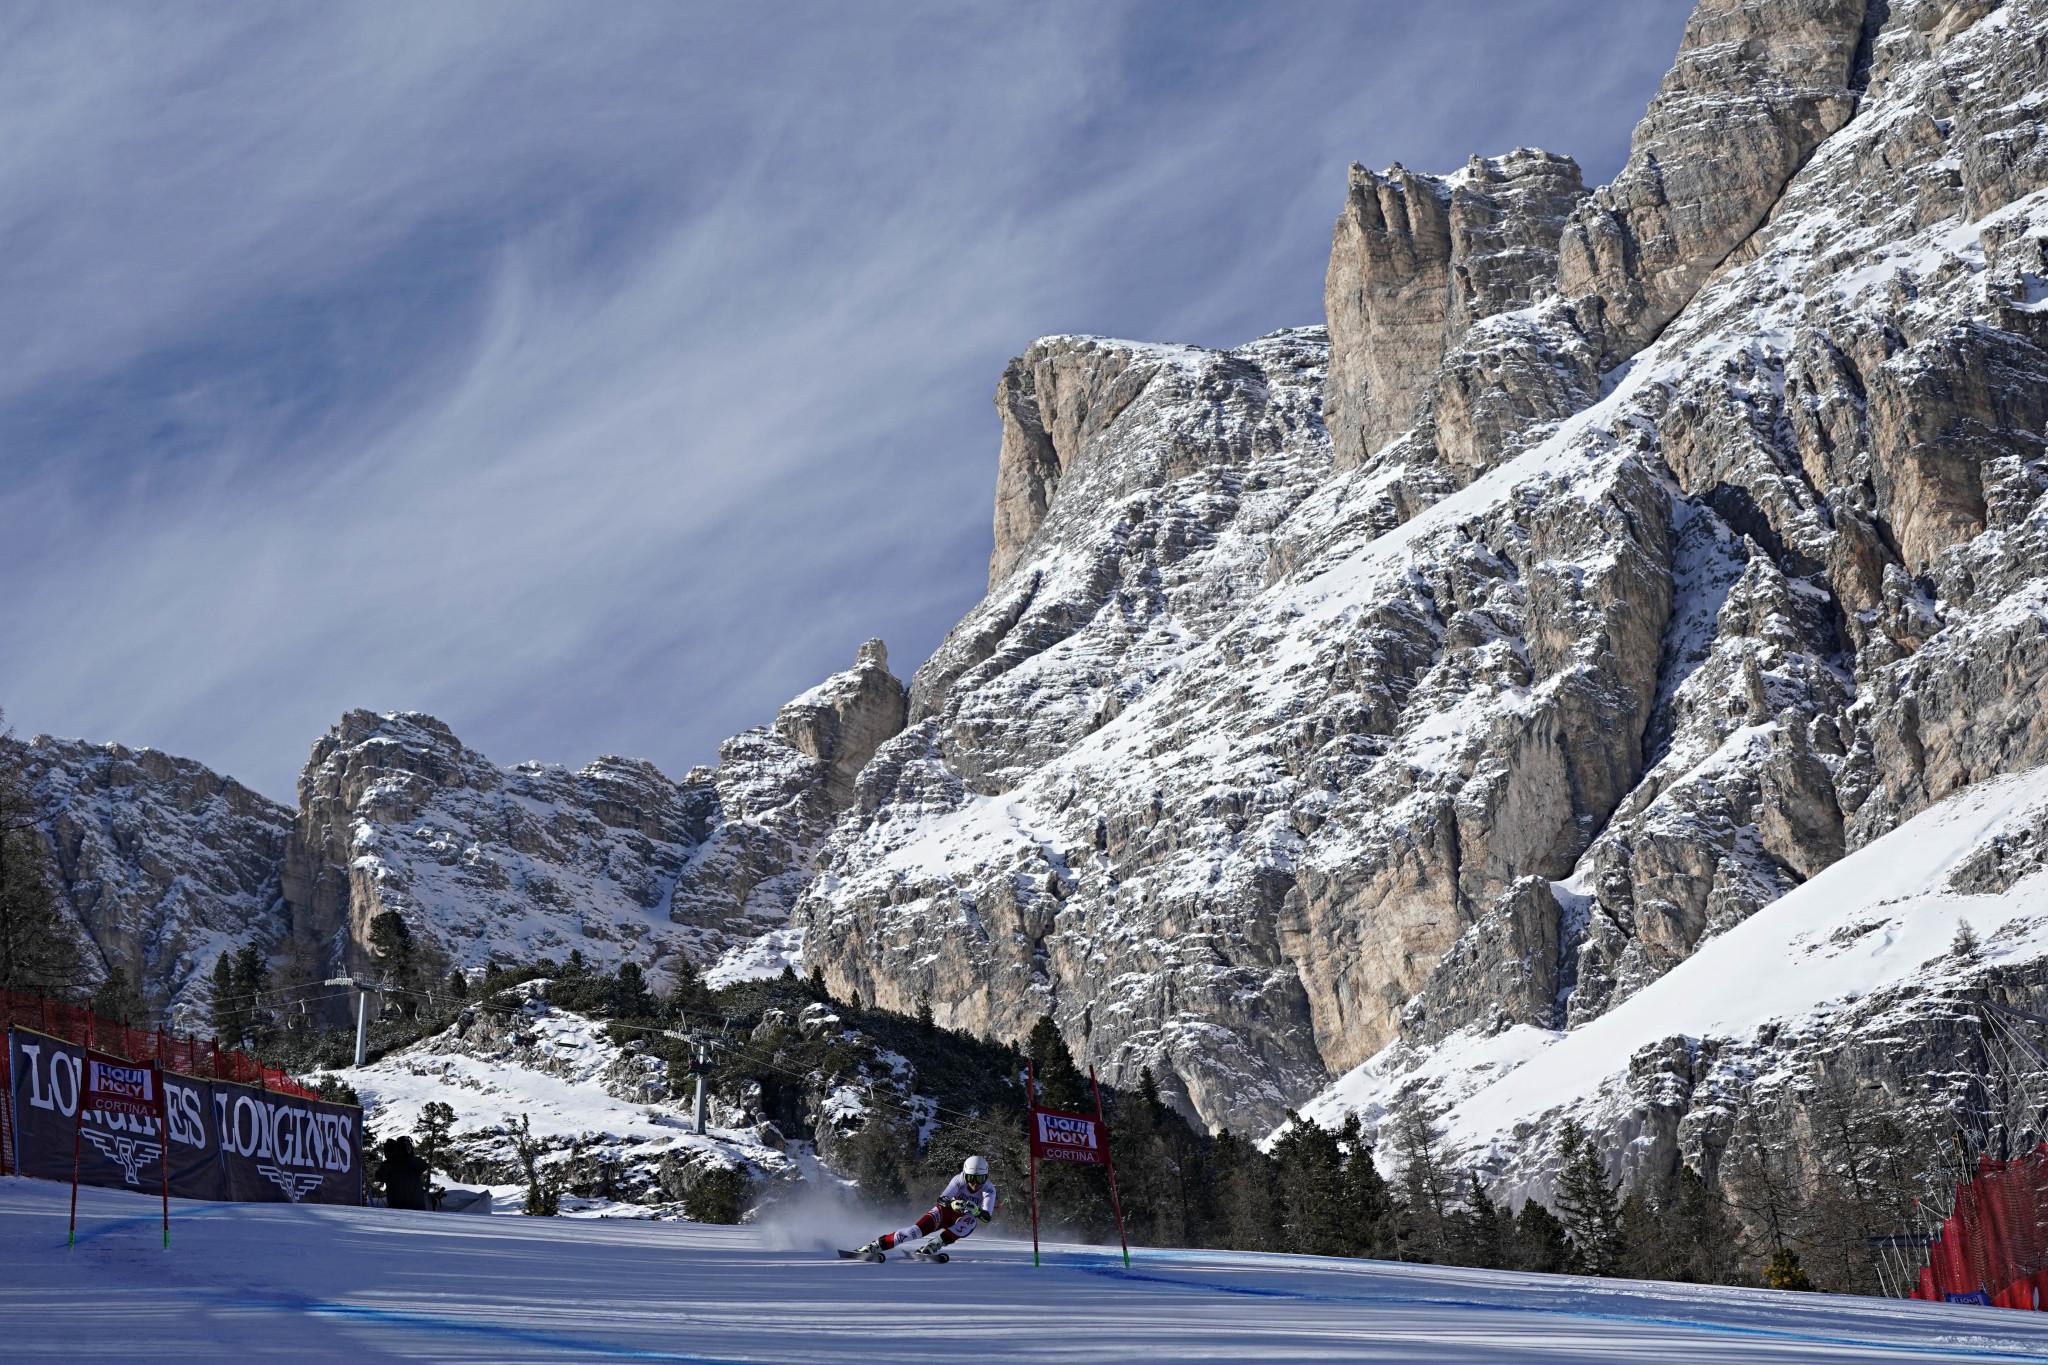 FIS holds coordination meeting for Cortina 2021 Alpine World Ski Championships